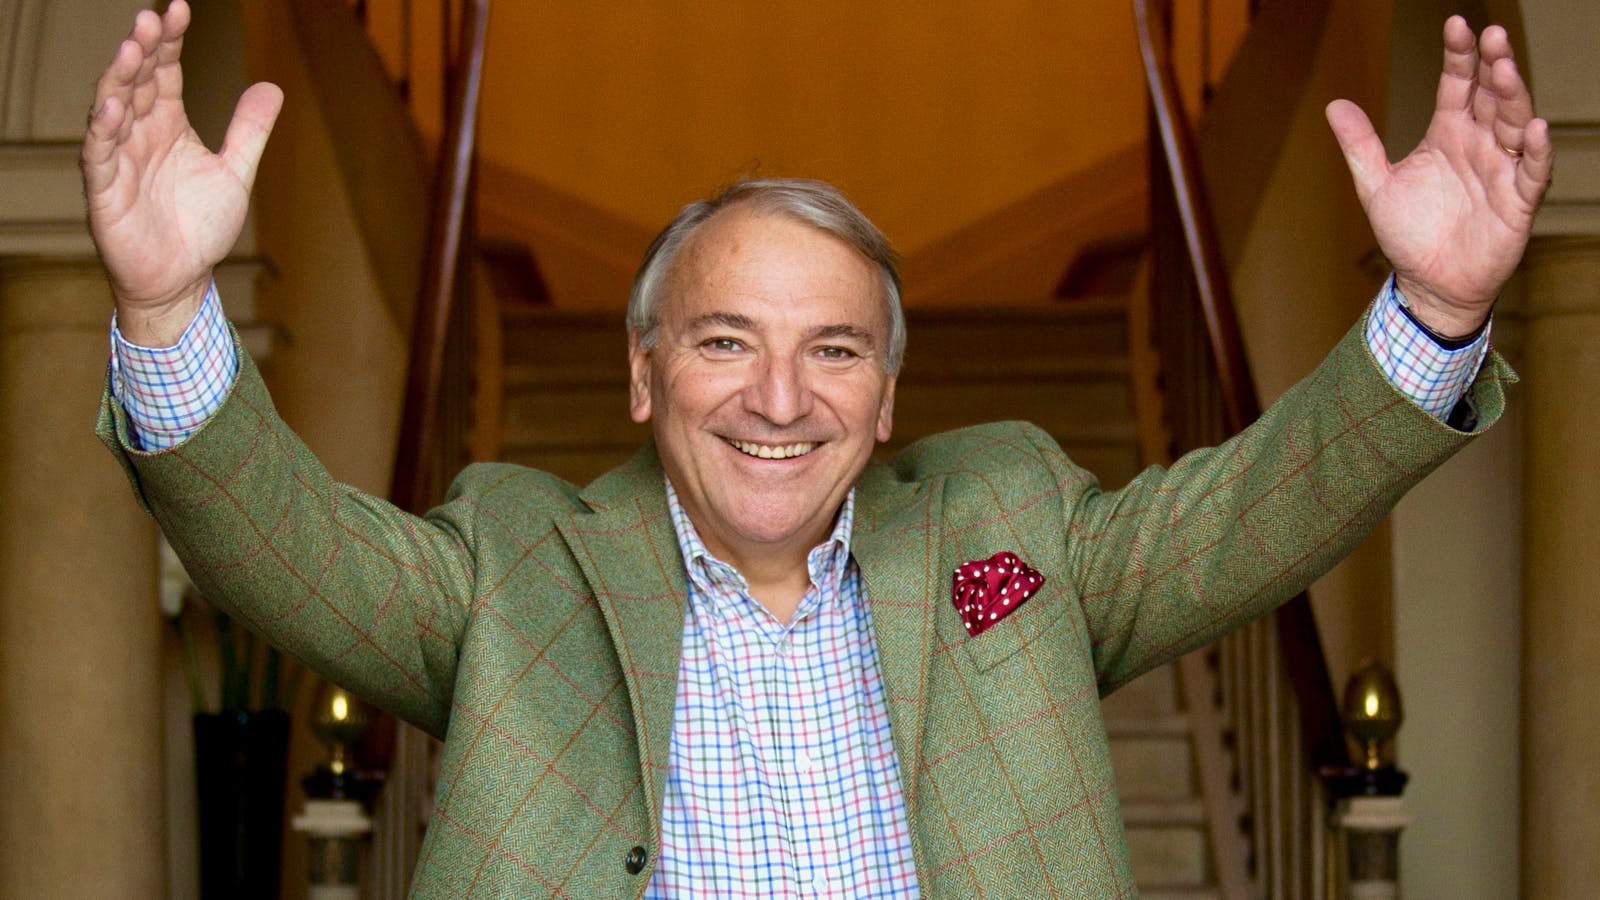 Bordeaux Vintner and Leader Patrick Maroteaux Dies at 67